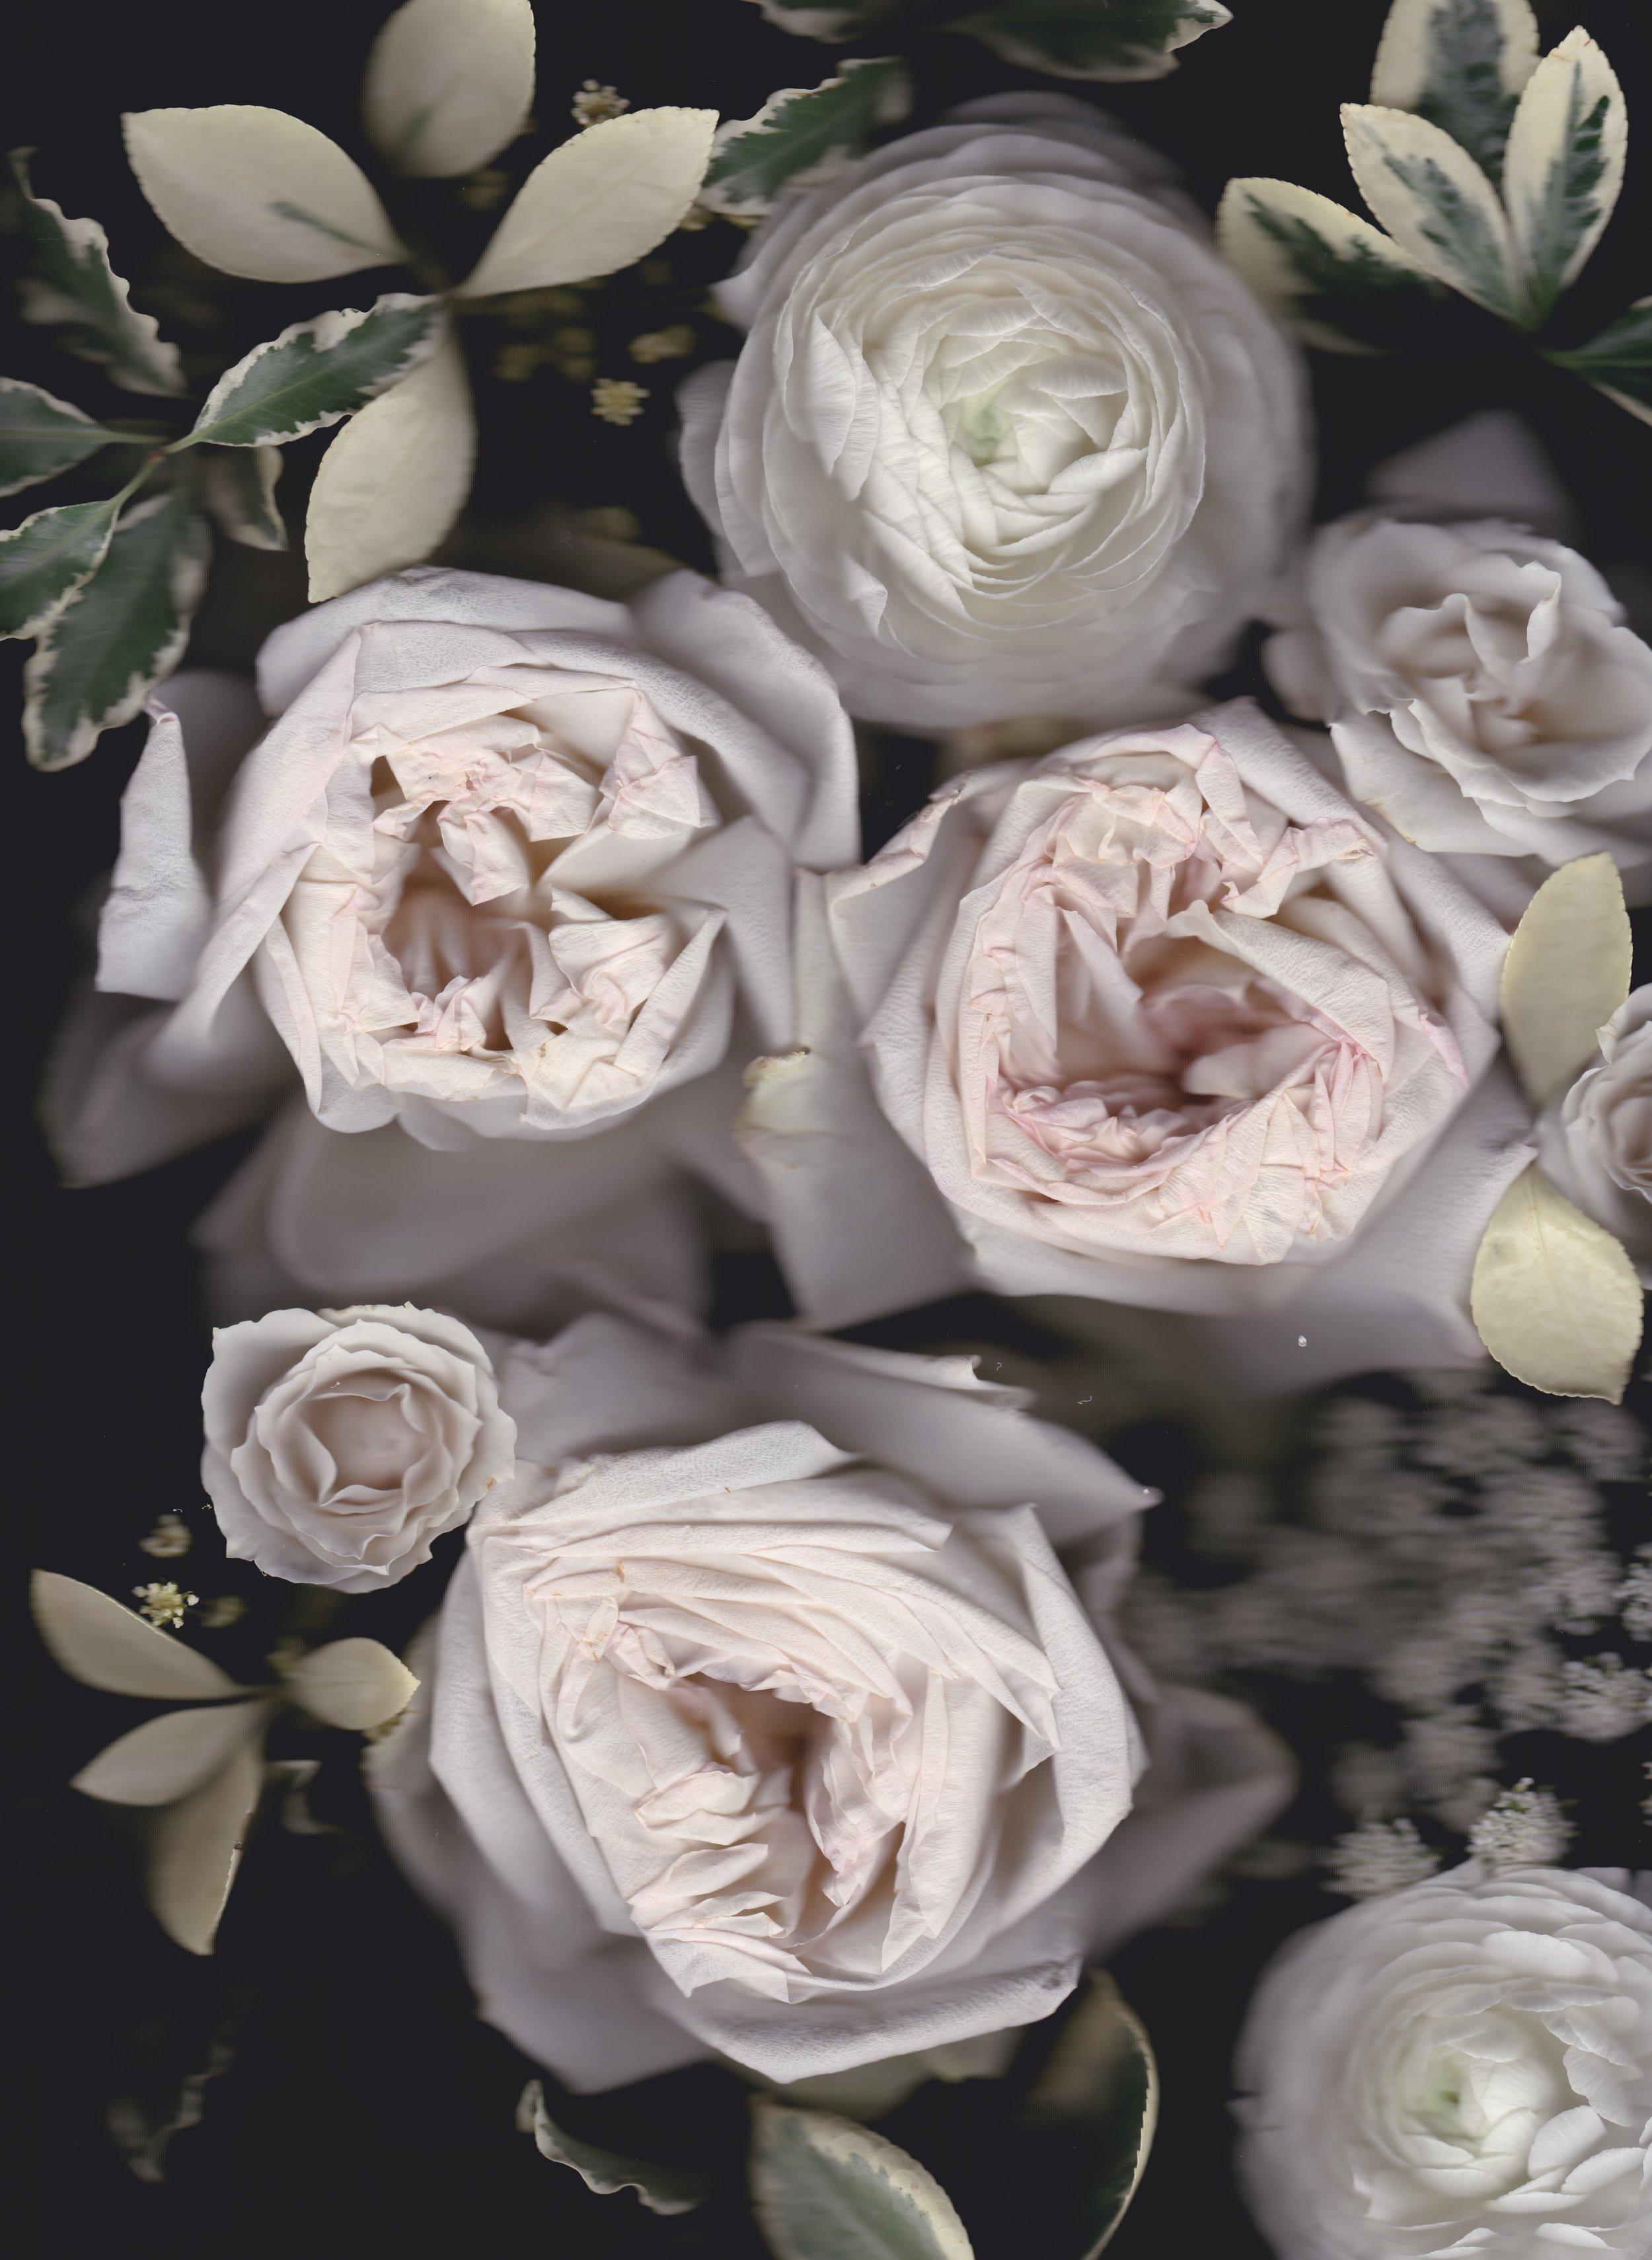 flowerscanjuly2018 2.jpeg